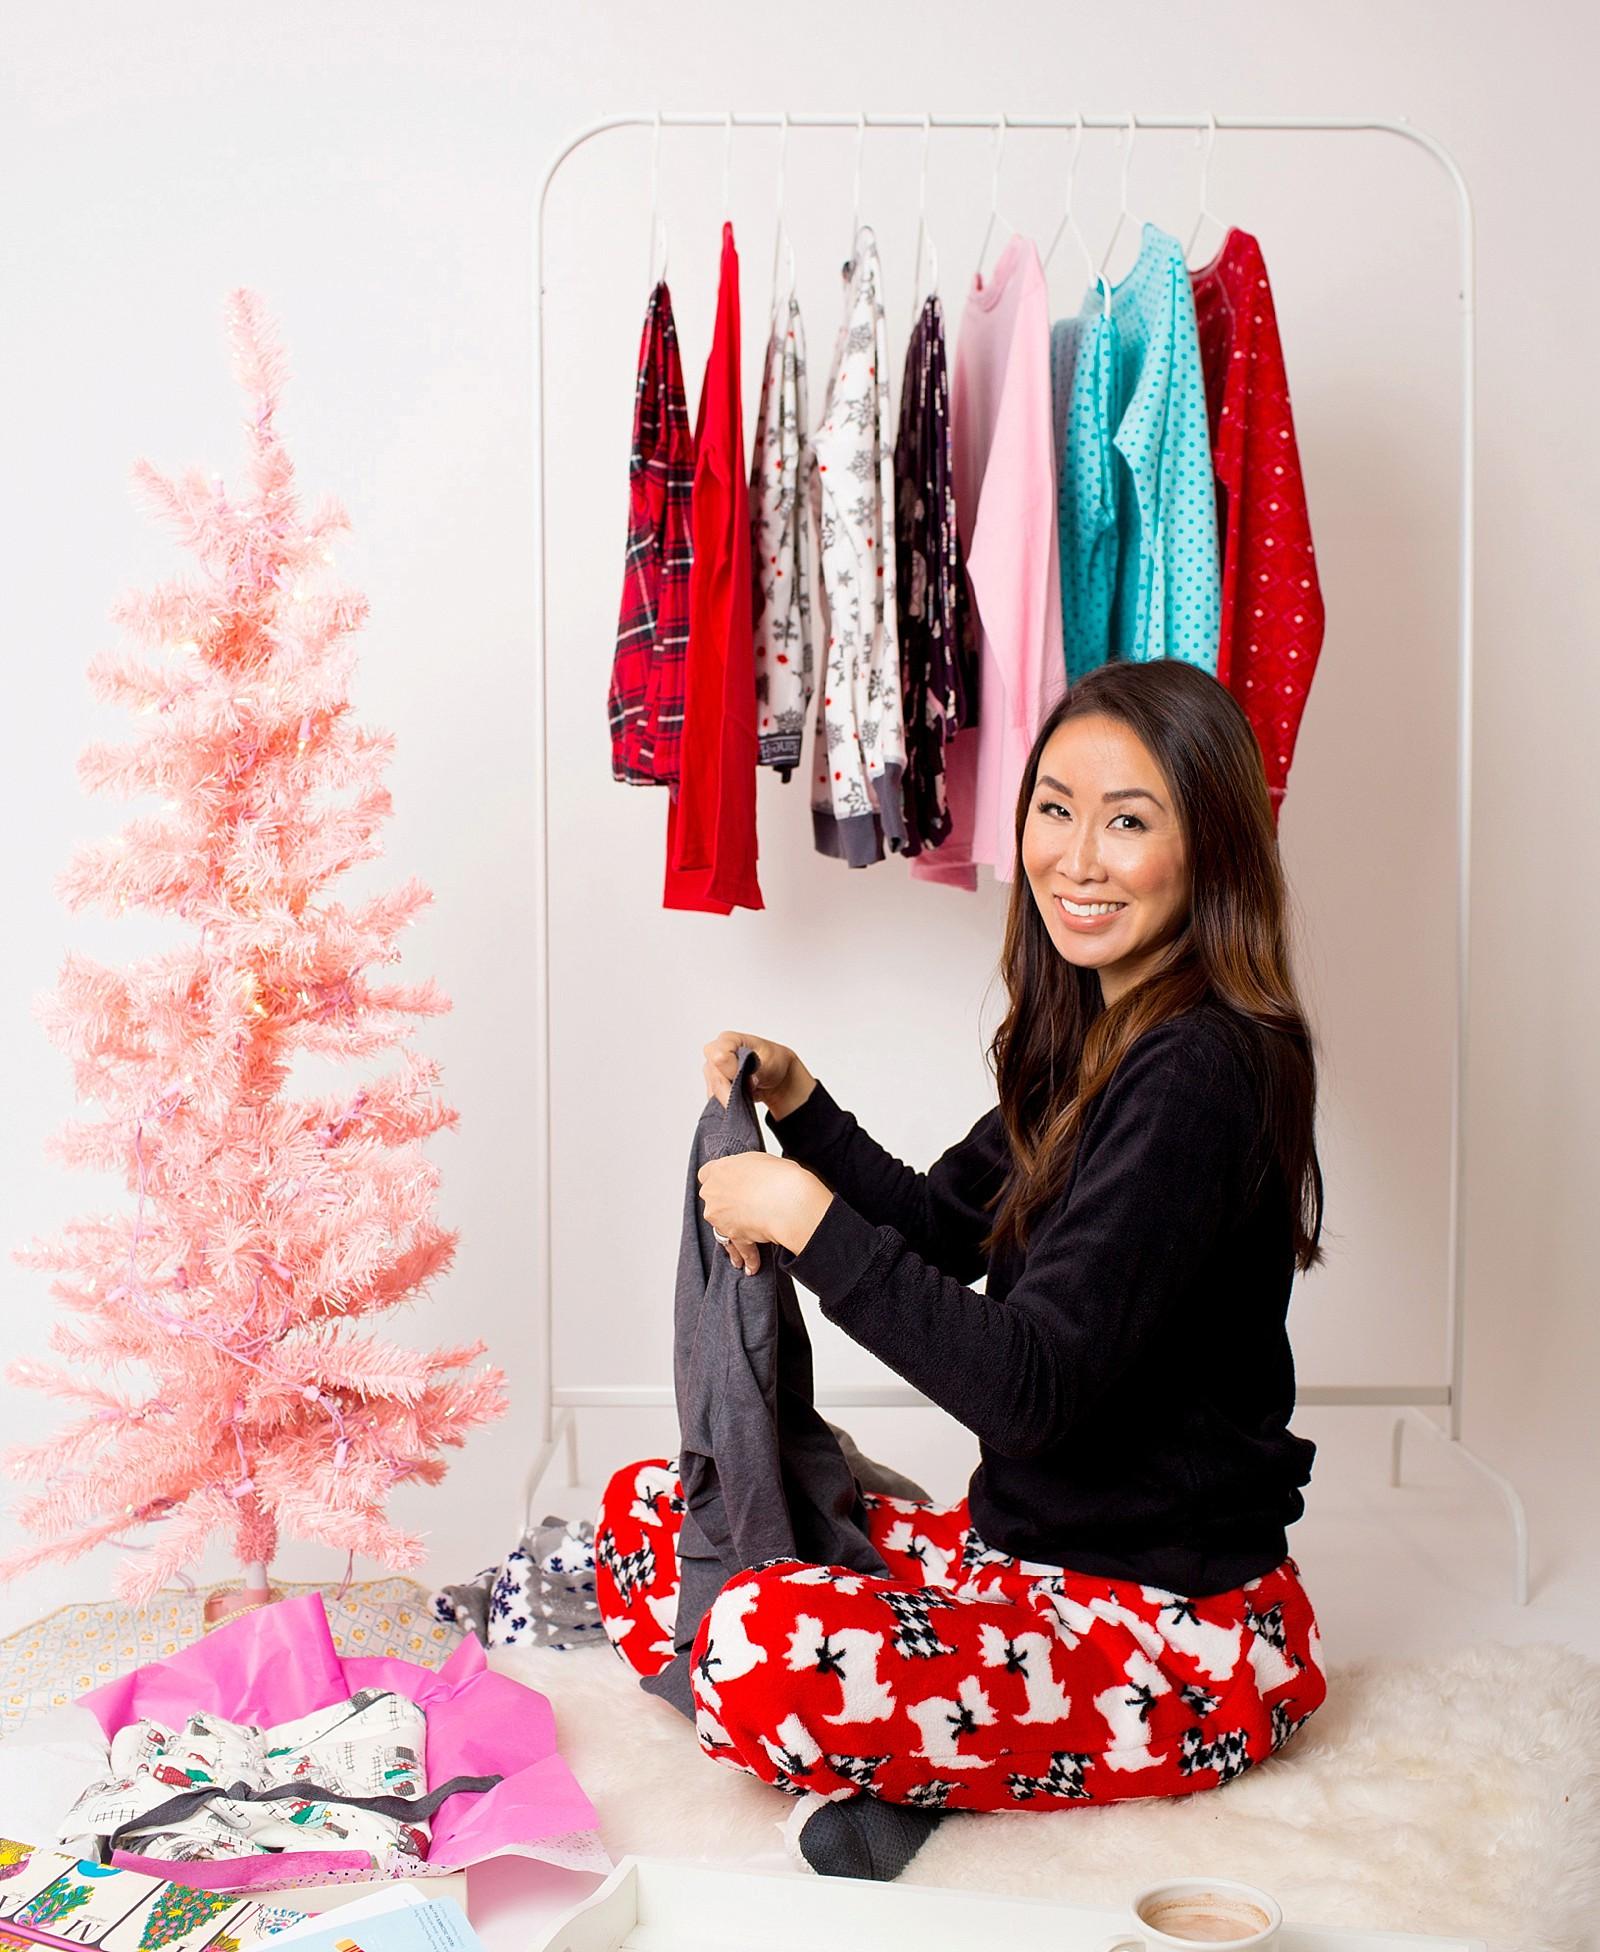 hanes-christmas-pajamas-girls-pajama-party-ideas-cute-jammies-diana-elizabeth-lifestyle-fashion-blogger-phoenix-arizona-1687a